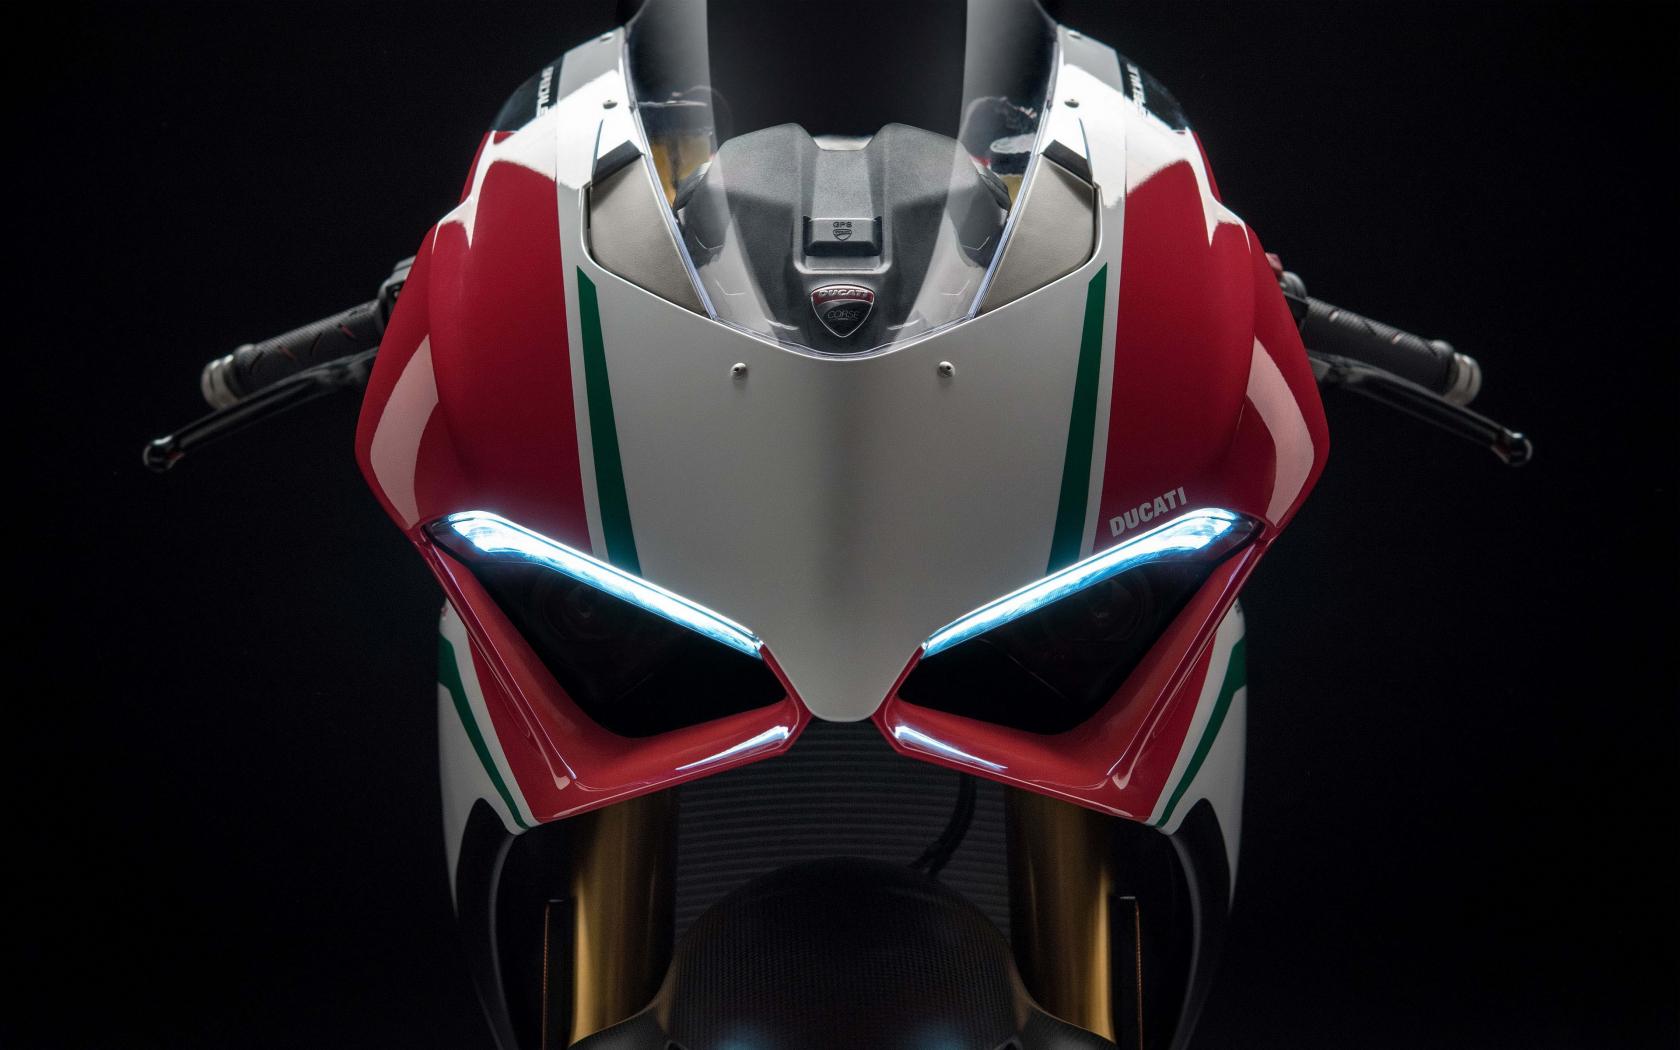 1680x1050 wallpaper 2018 Ducati Panigale V4, superbike, 4k